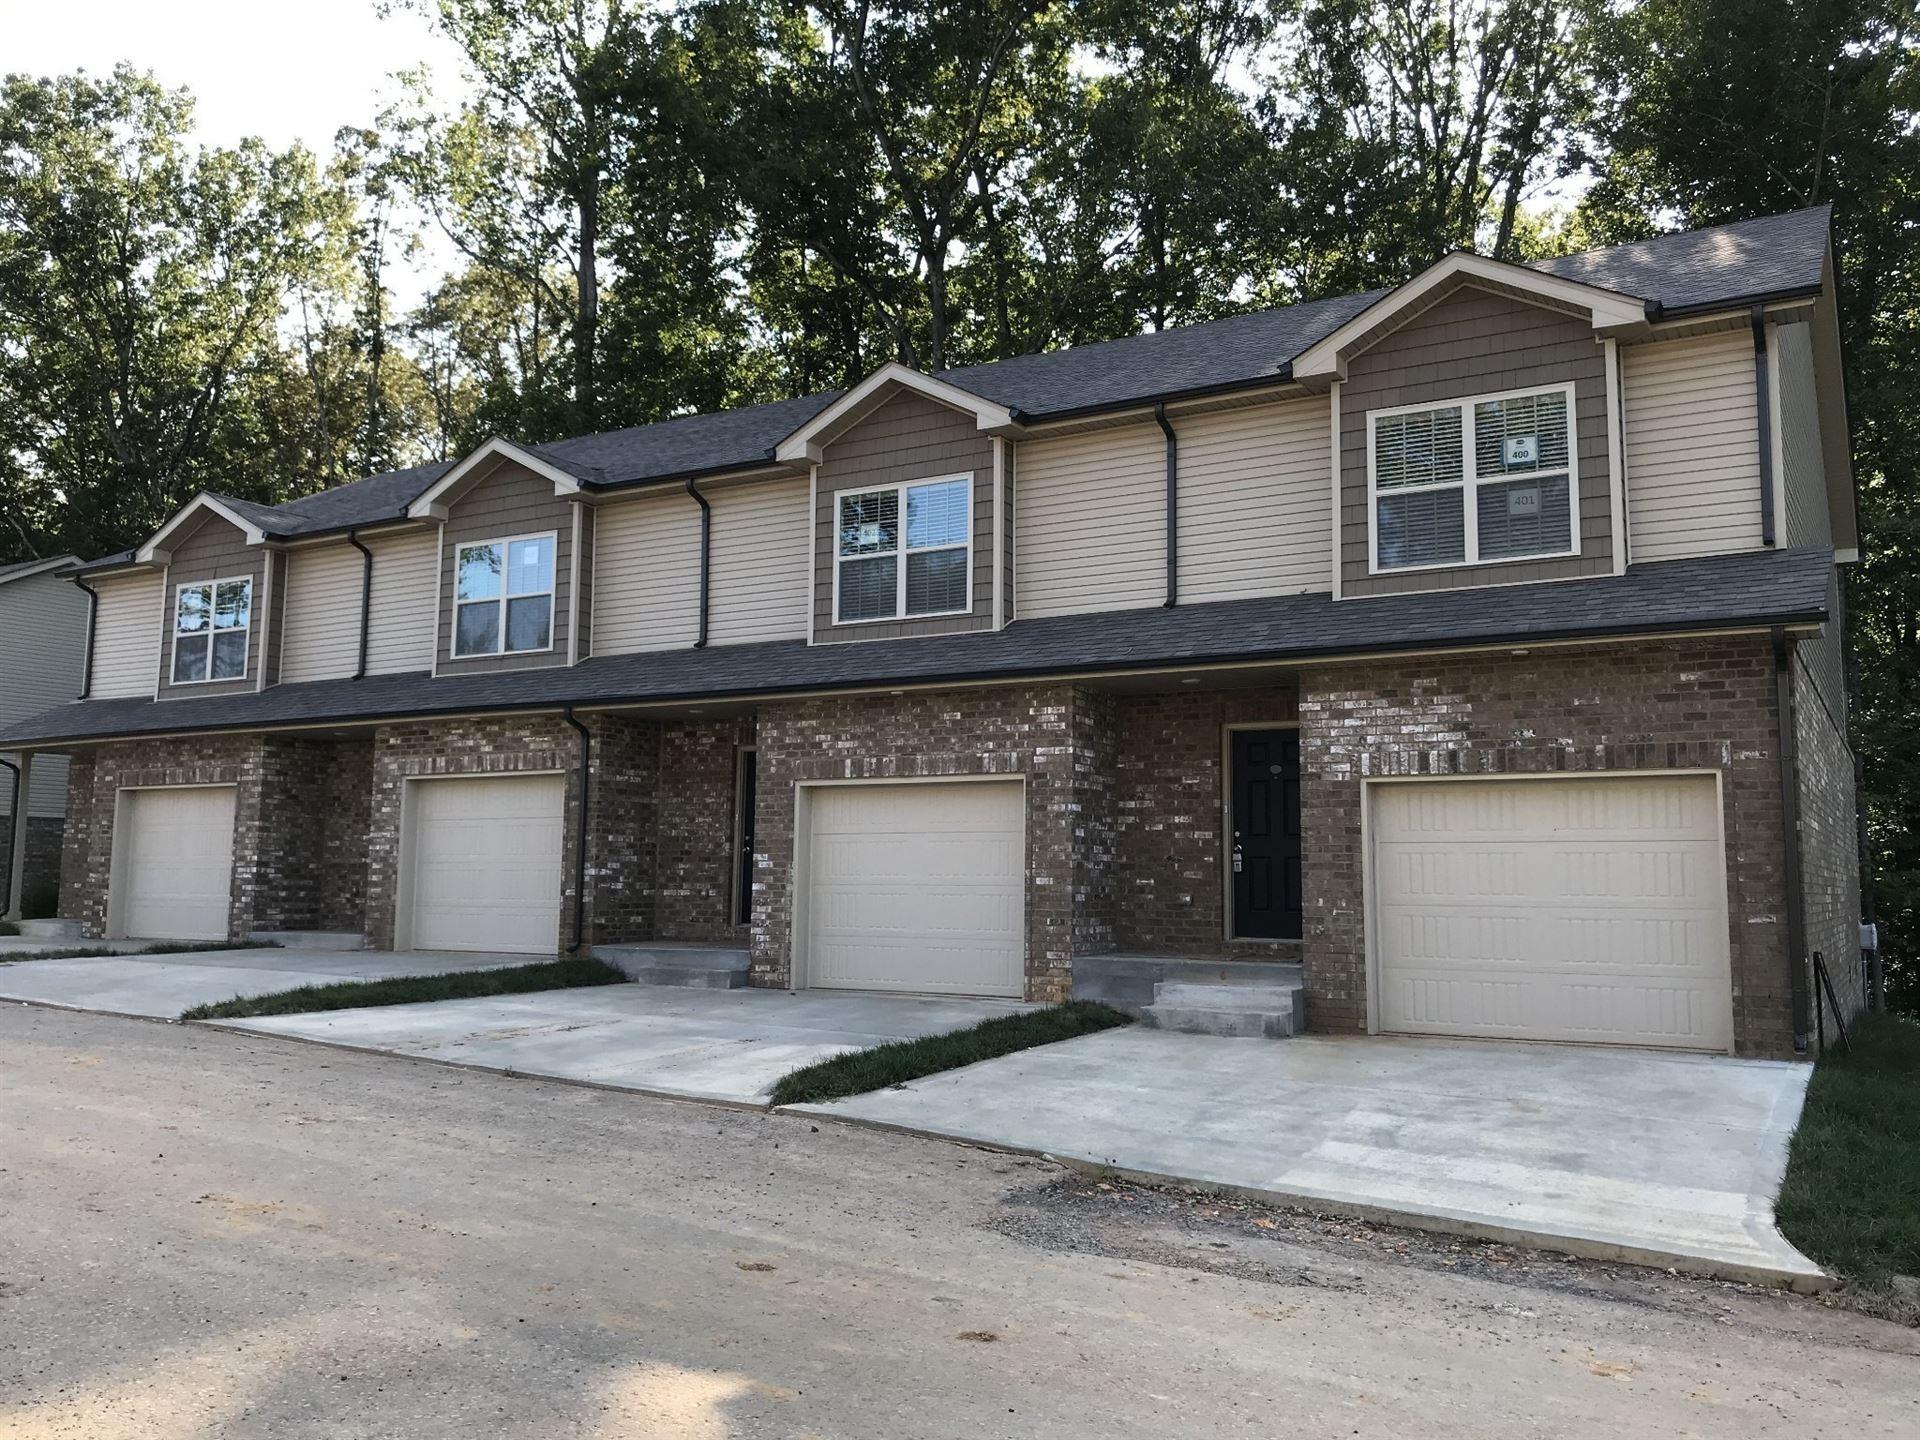 135 Country Lane Unit 203, Clarksville, TN 37043 - MLS#: 2211660